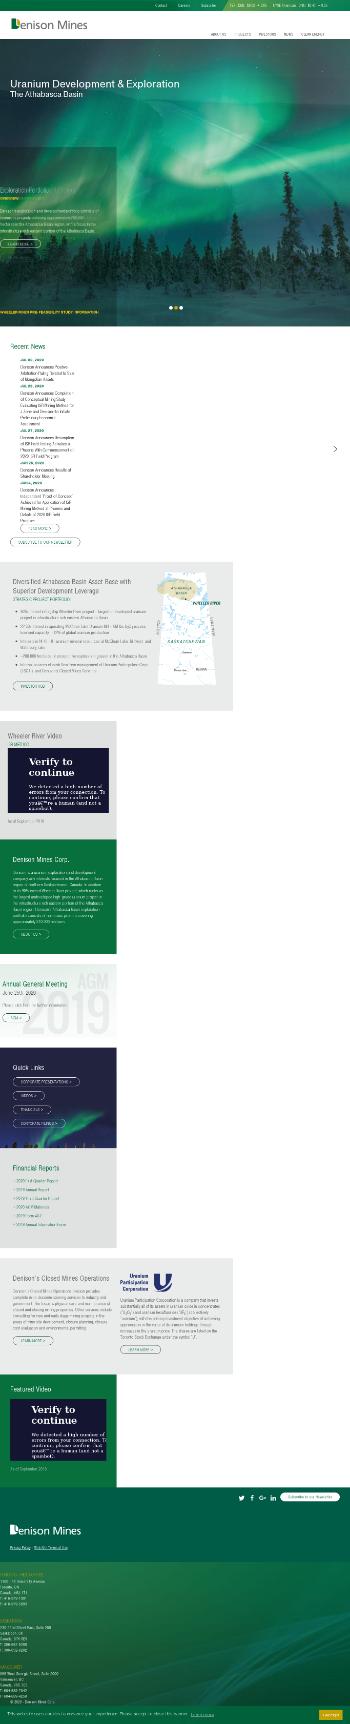 Denison Mines Corp. Website Screenshot